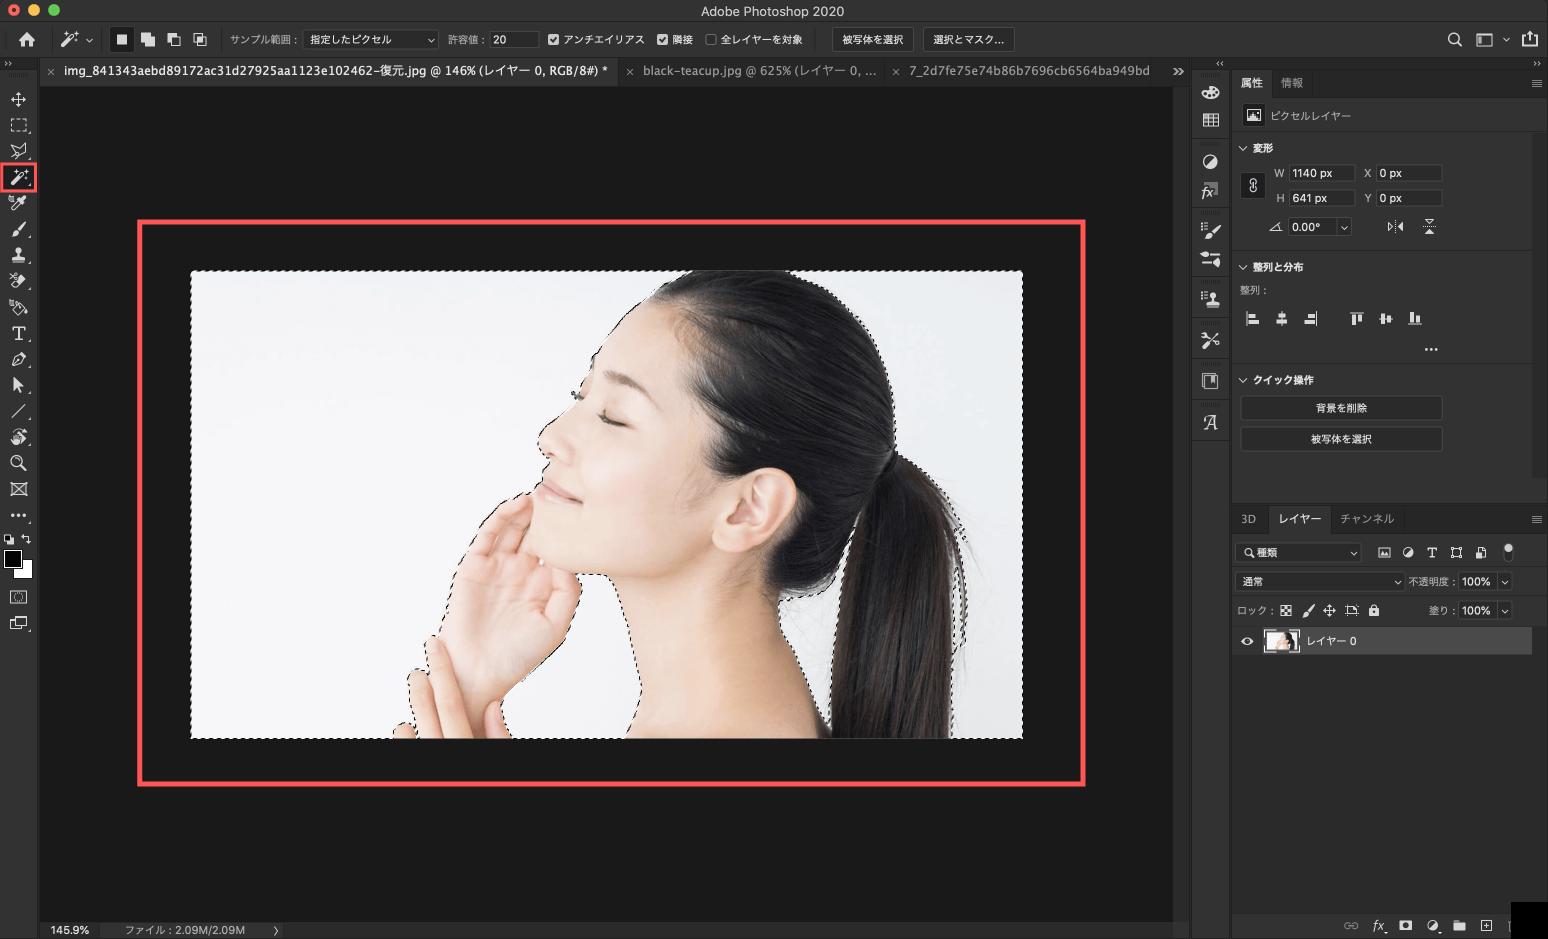 Adobe CC Photoshop フォトショップ 切り抜き 髪の毛 簡単 切り抜き 切り抜き素材 画像自動選択ツールで背景を全て選択する